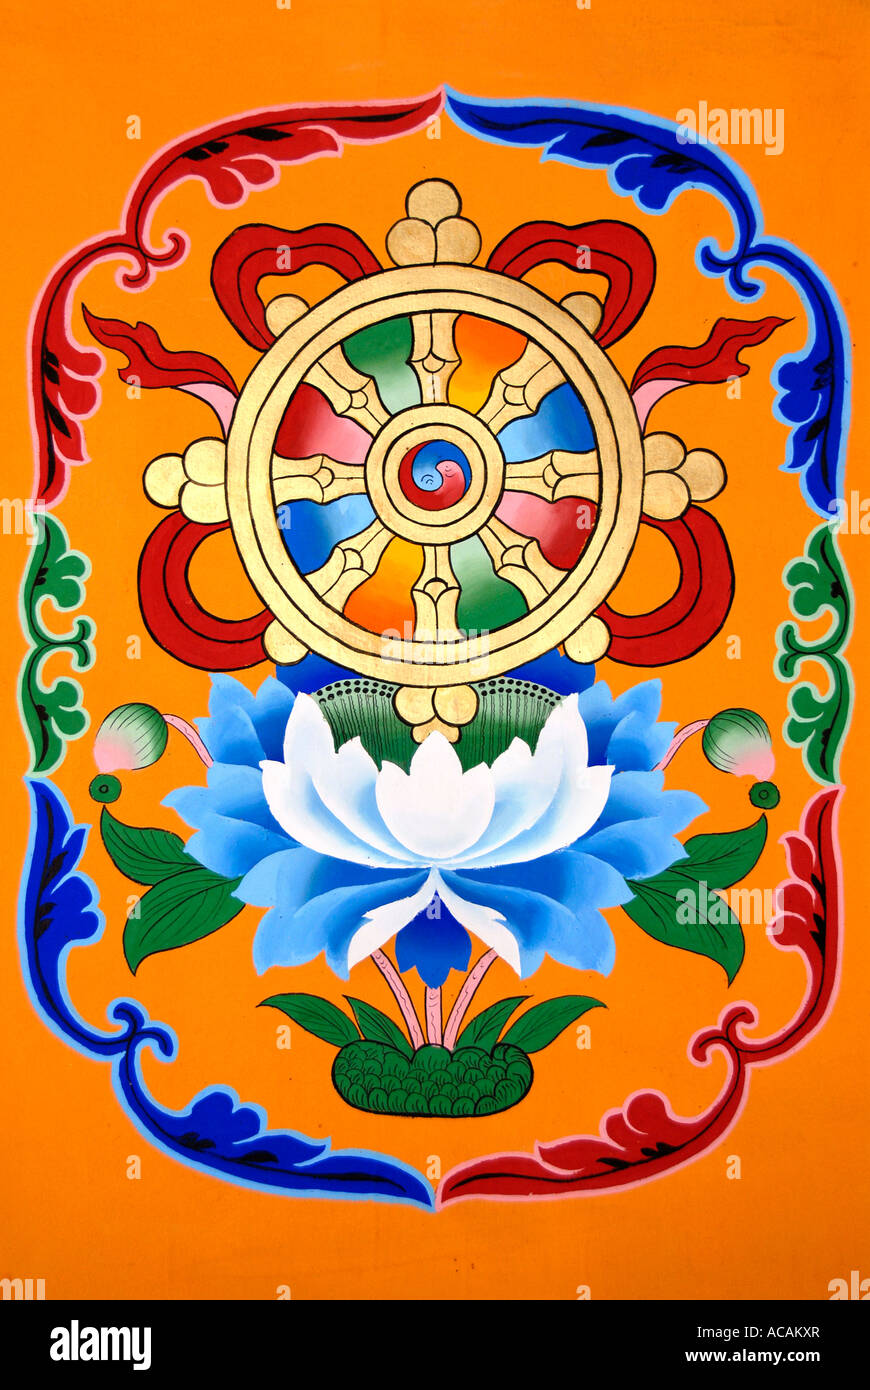 Tibetan buddhism painting symbol wheel of life above lotus flower tibetan buddhism painting symbol wheel of life above lotus flower jokhang lhasa tibet china buycottarizona Gallery